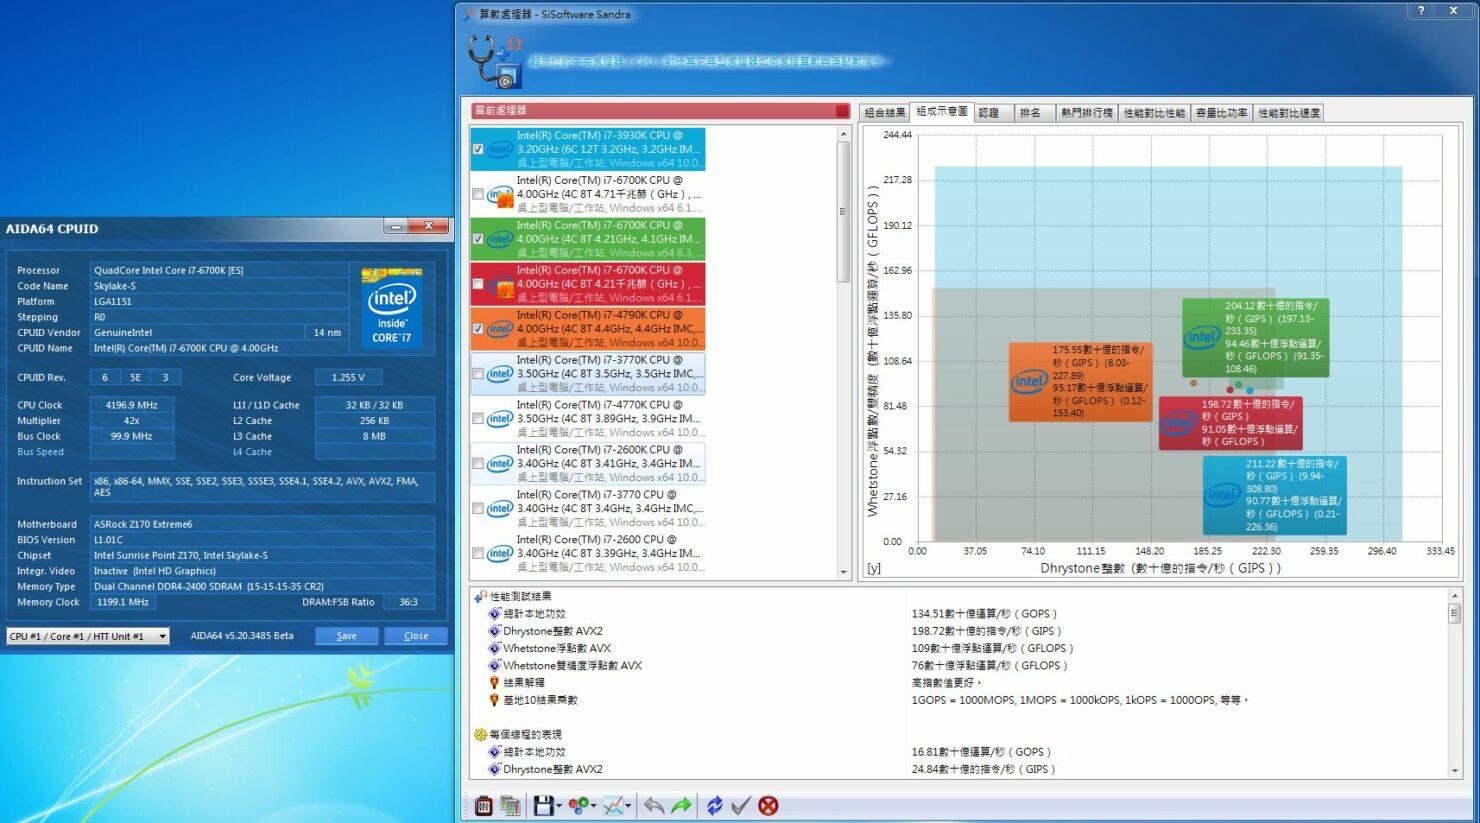 intel-core-i7-6700k_stock_sandra-cpu